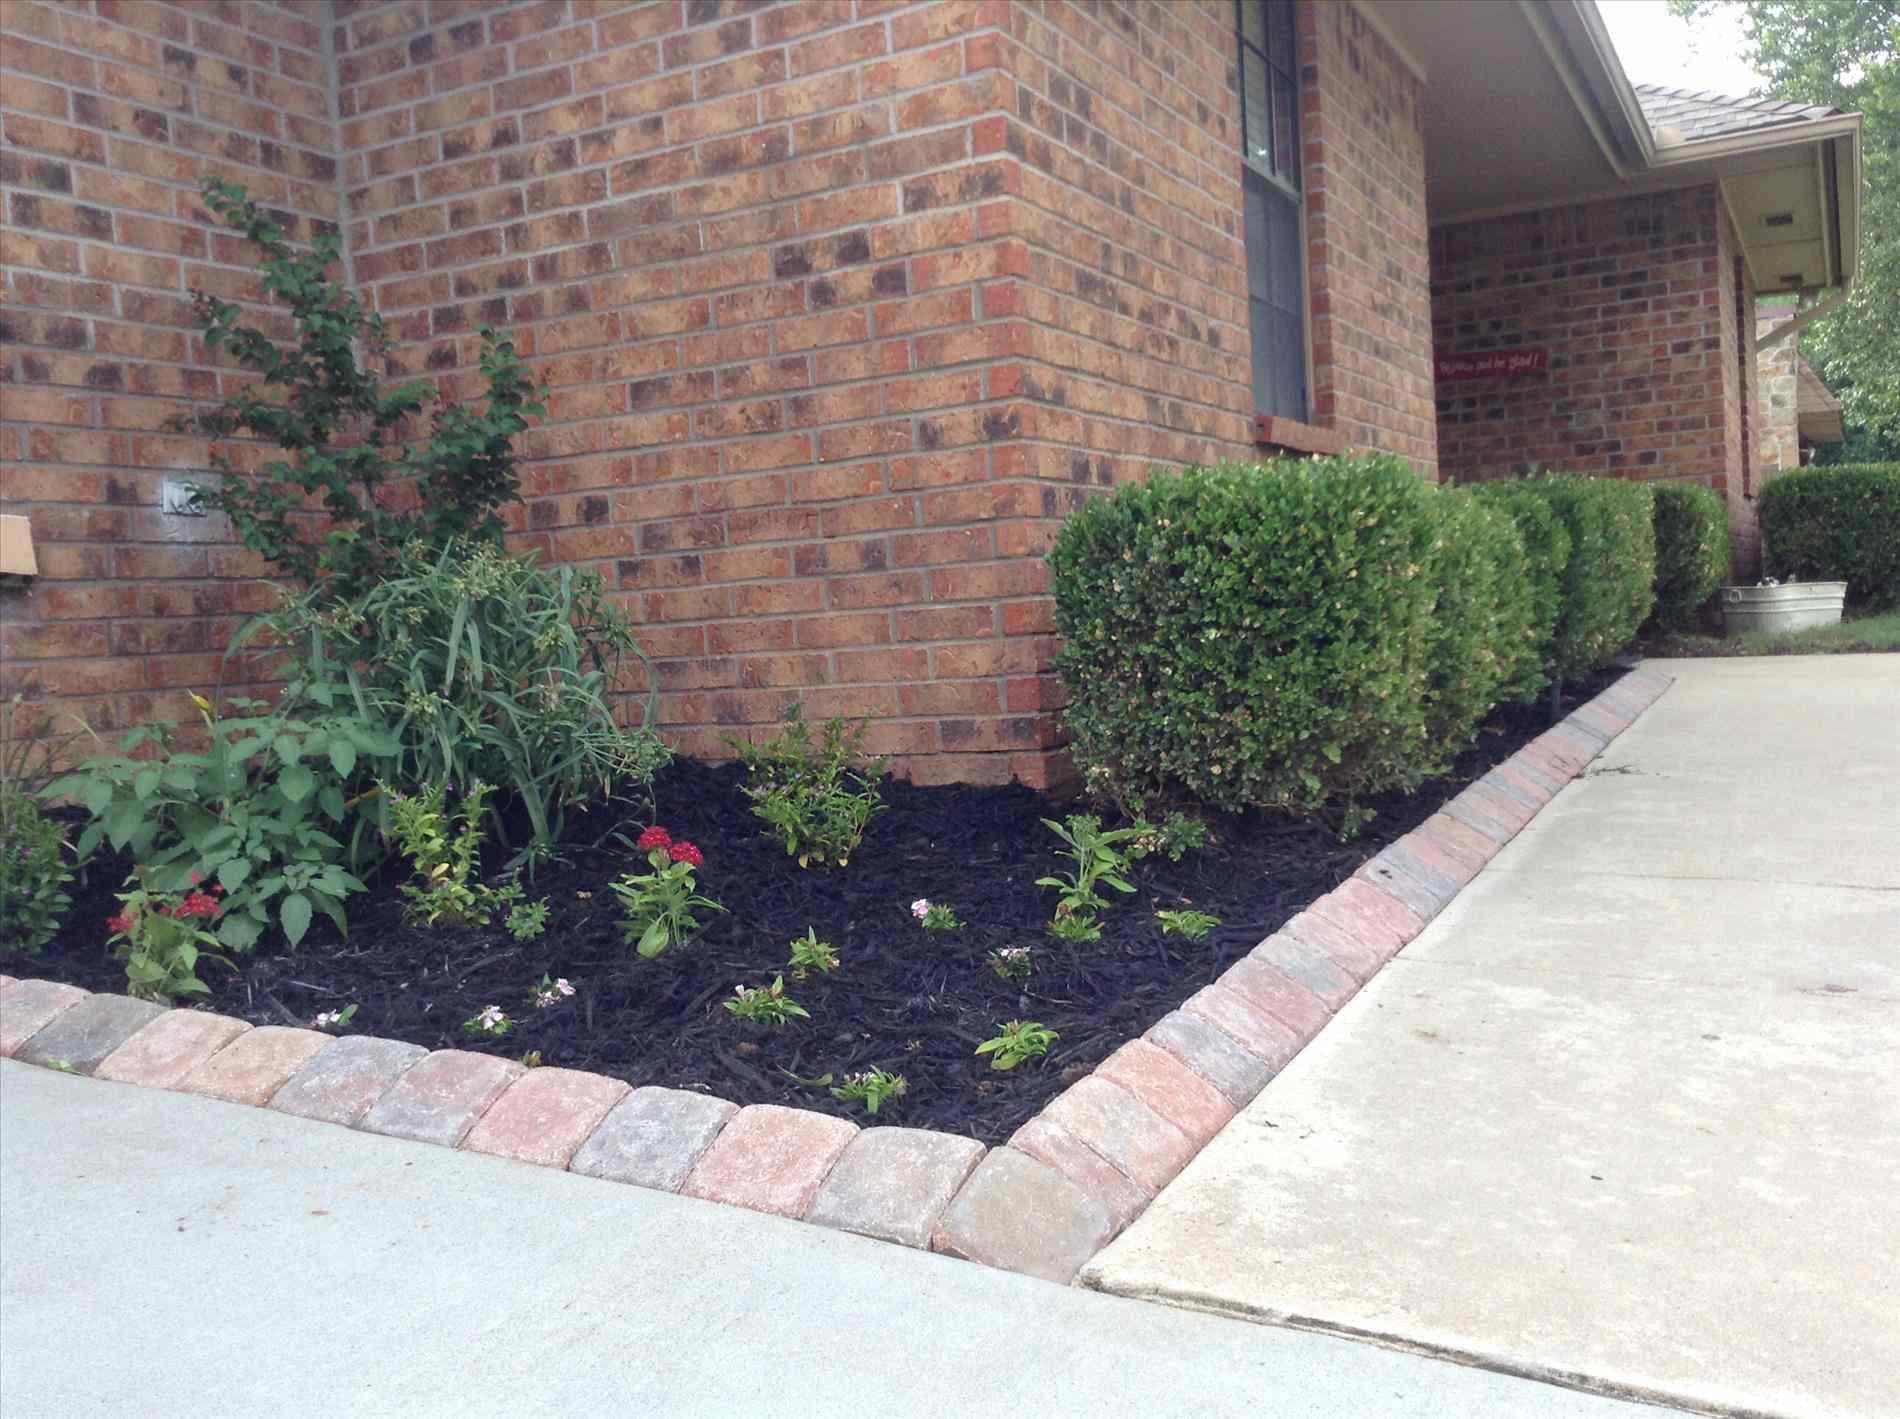 Best ideas about Home Depot Landscape Edging . Save or Pin Ideas Home Depot Landscape Edging Now.